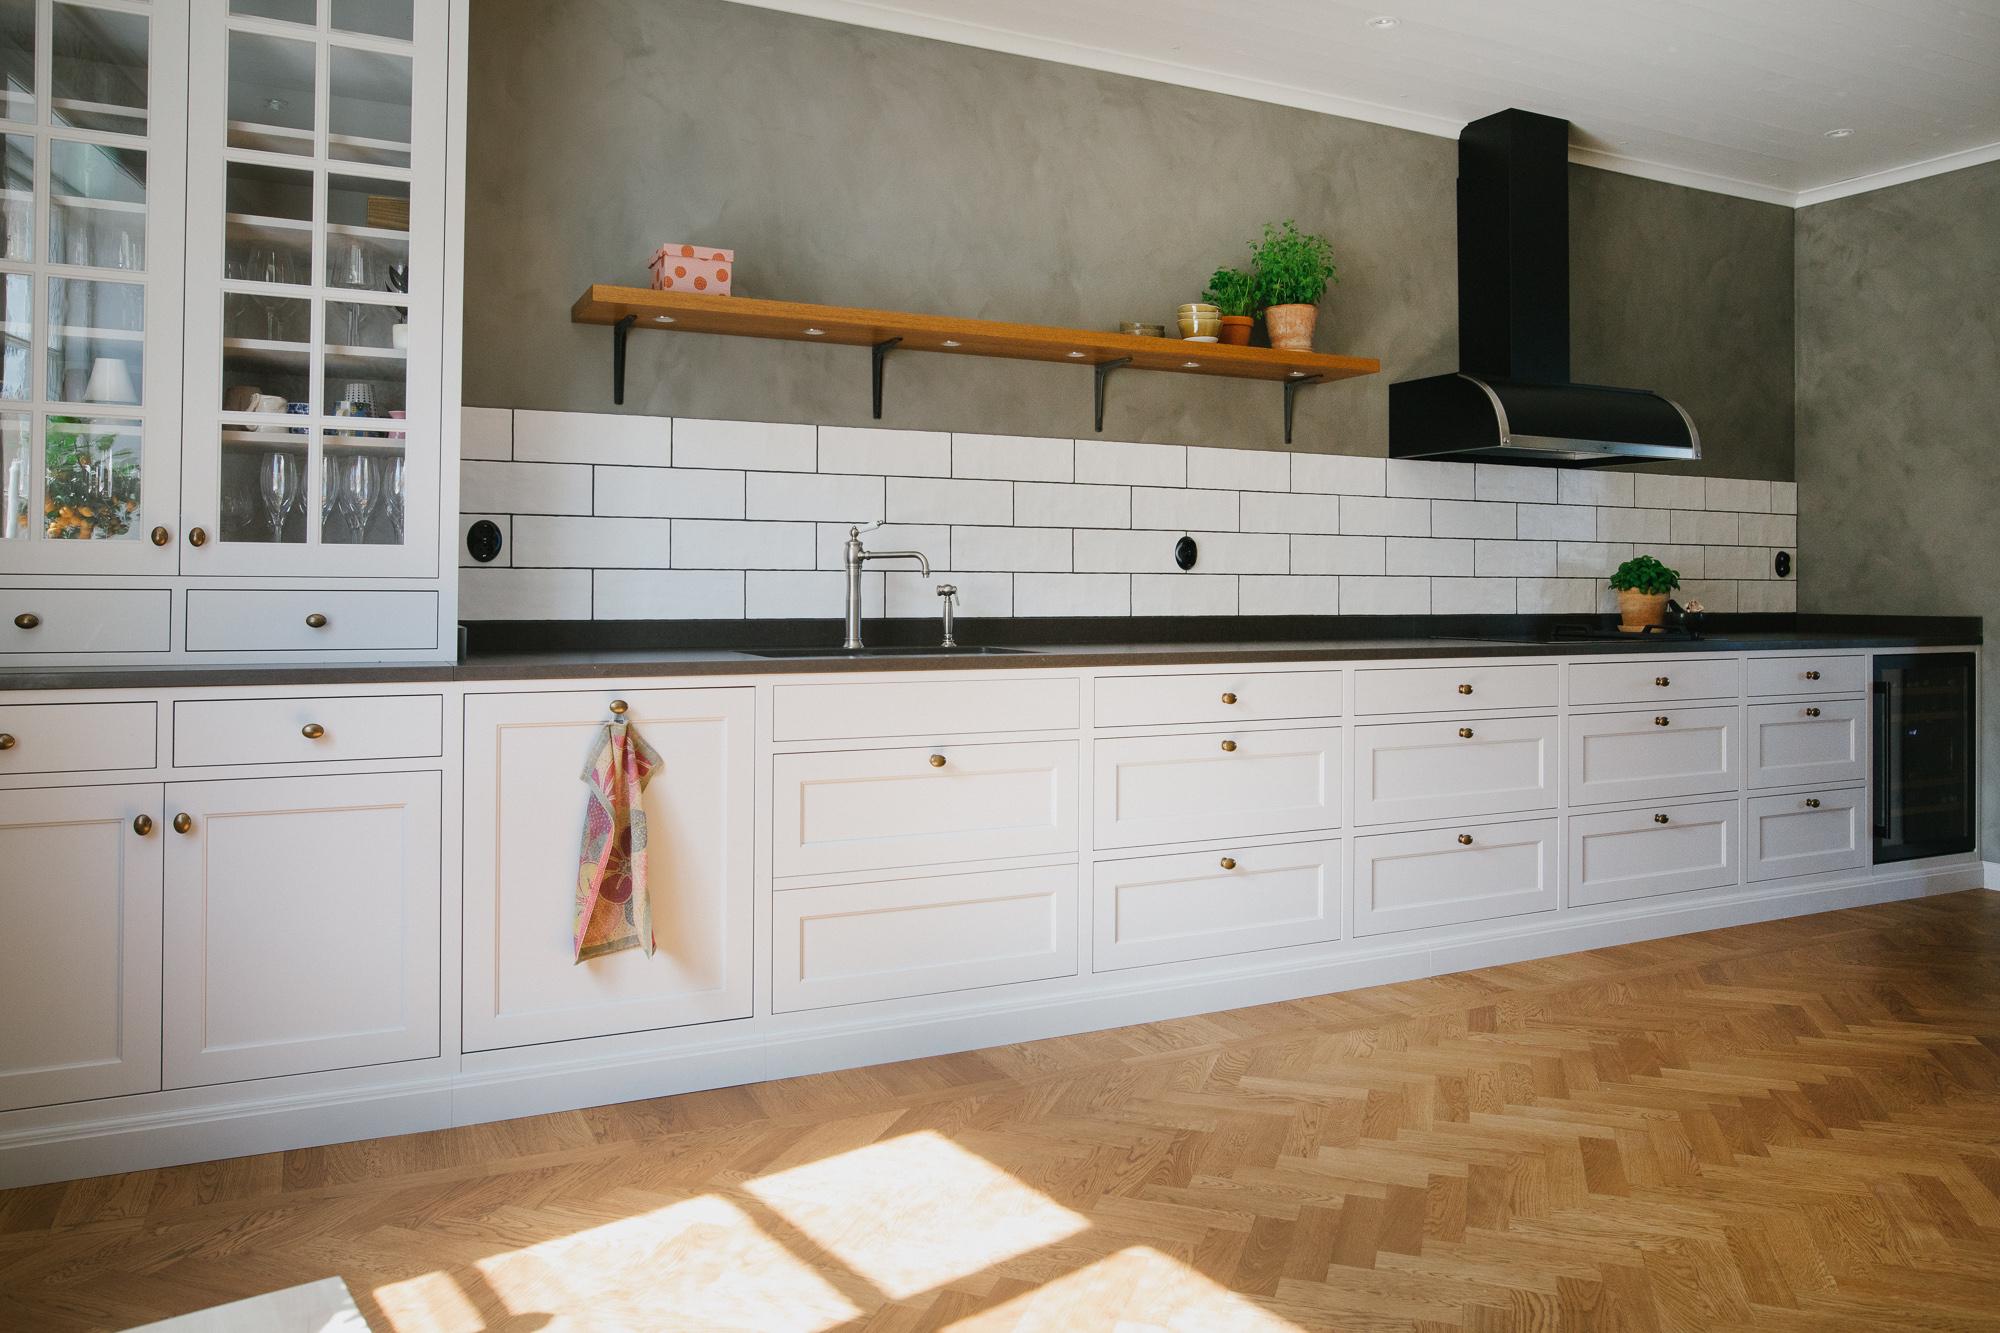 tidlöst kök, genuina material, visby kök, kök Gotland